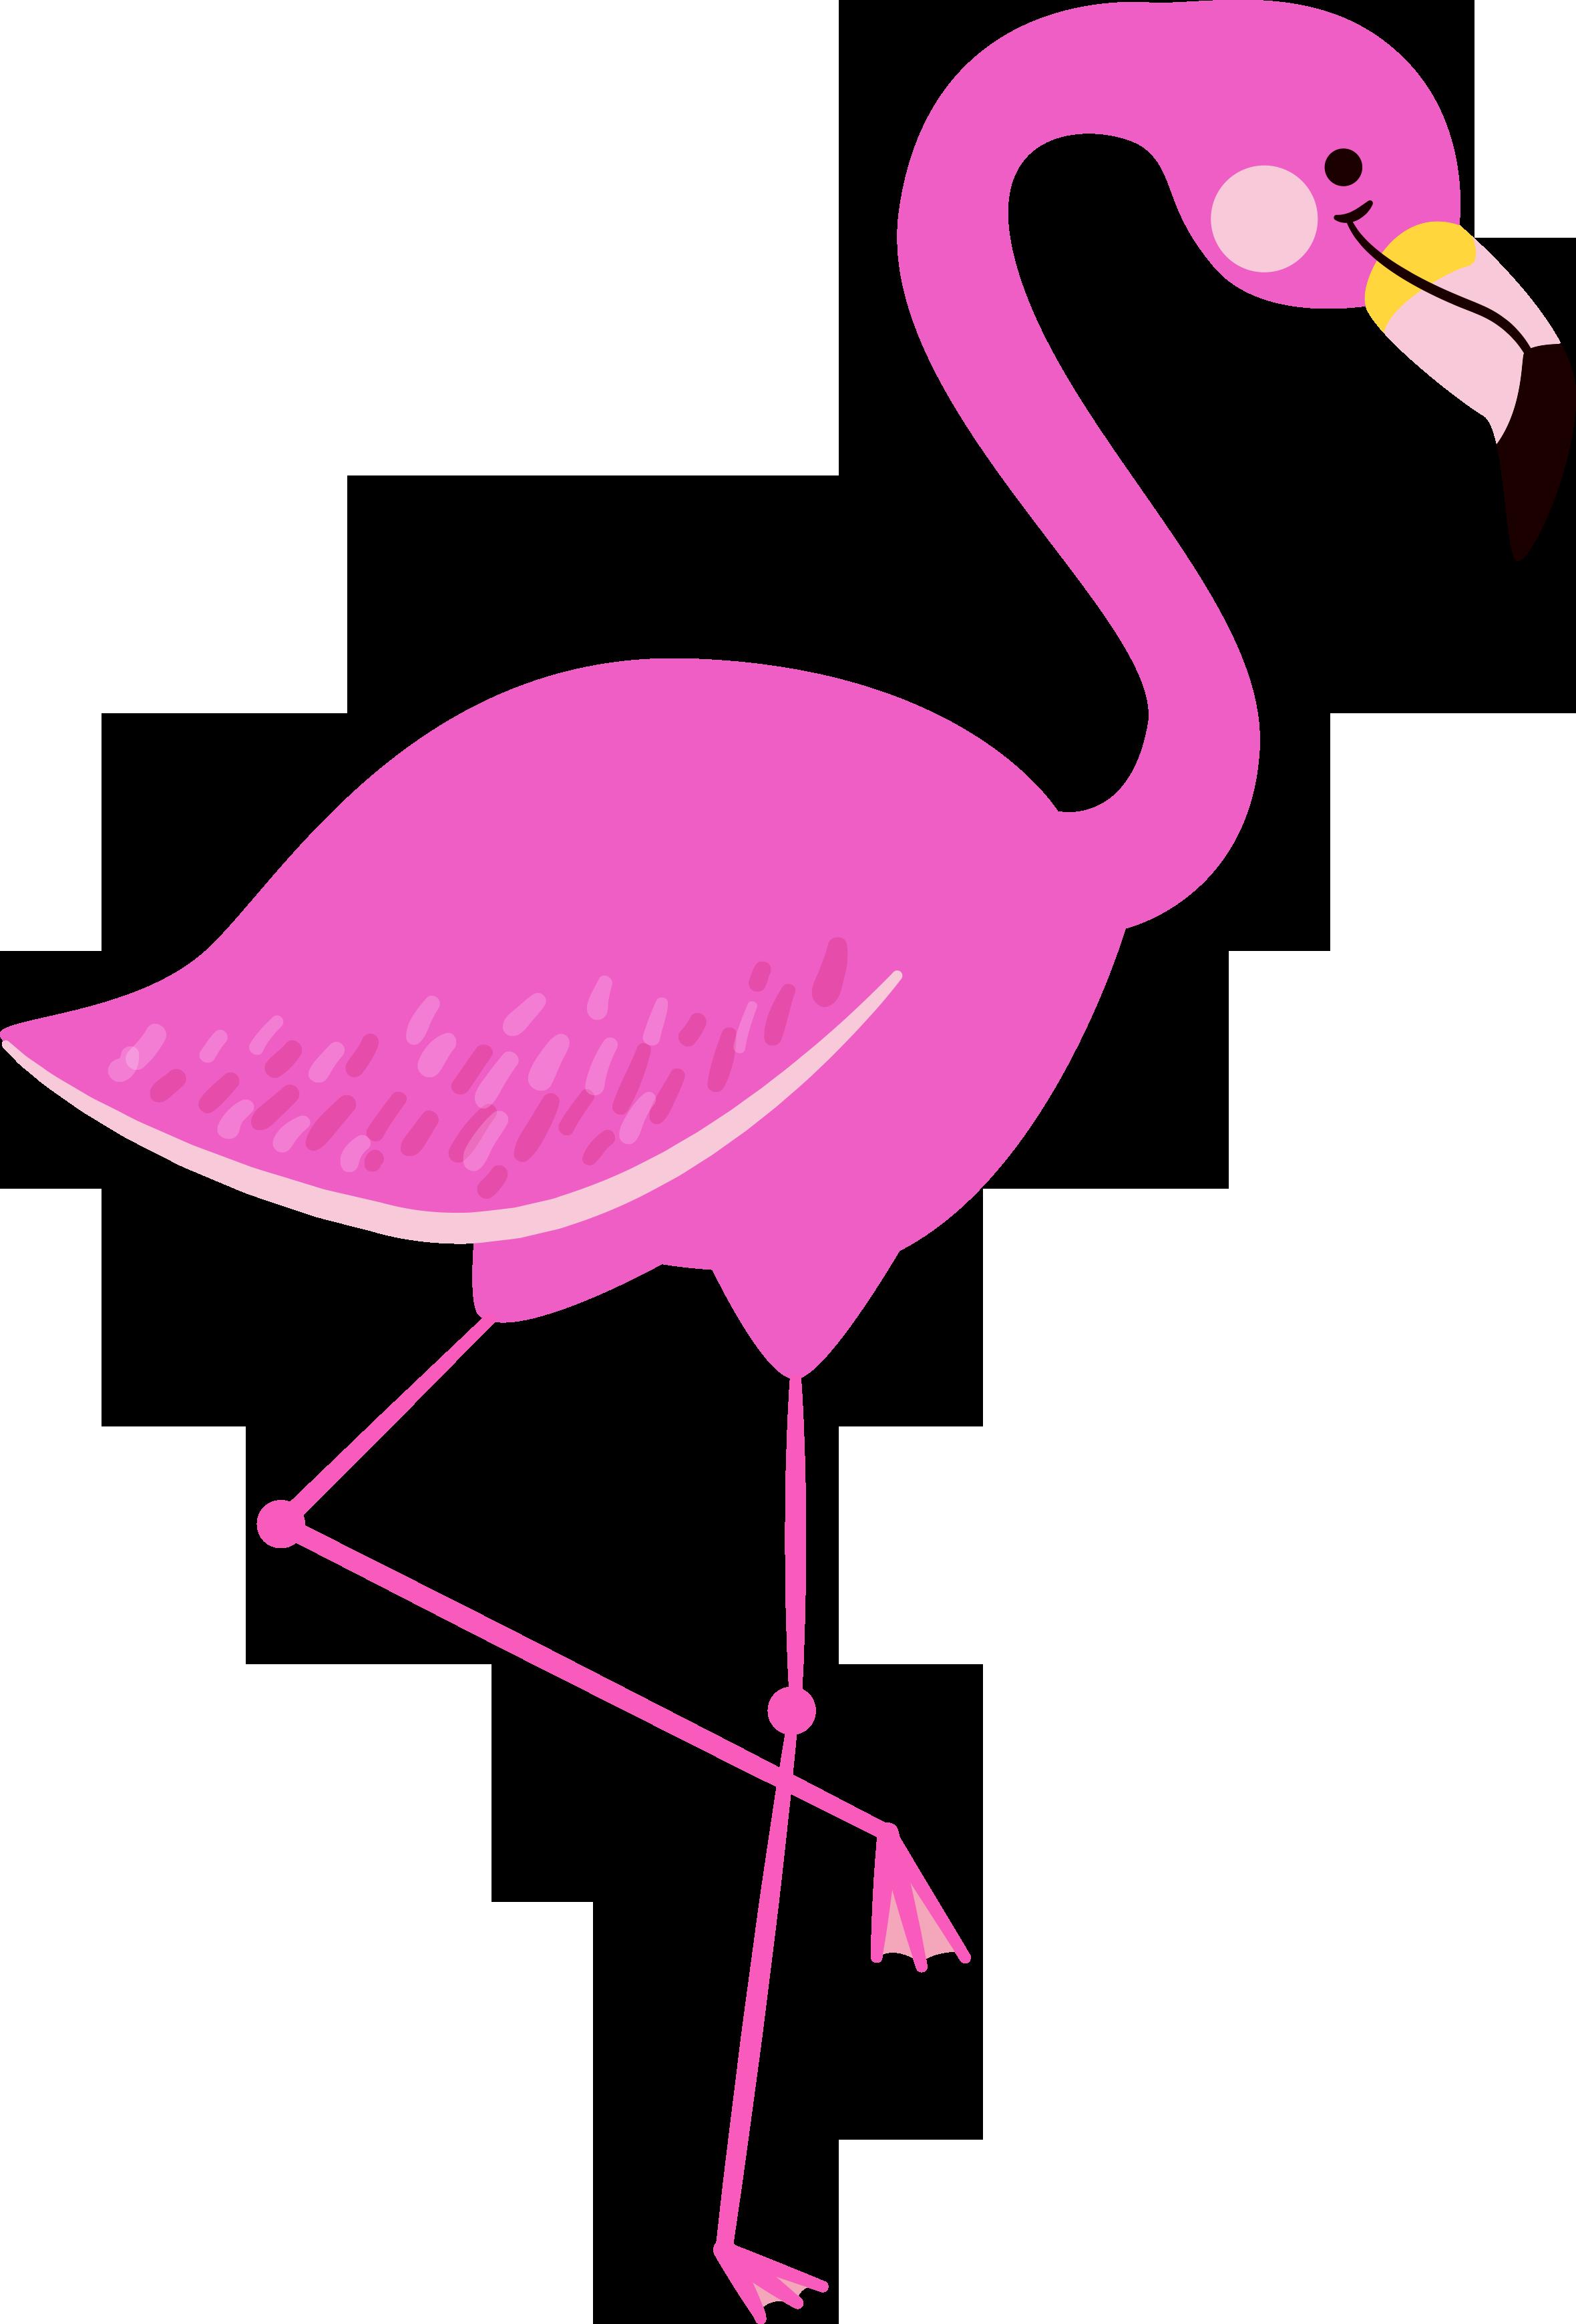 Free summer fun pretty. Clipart pineapple flamingo